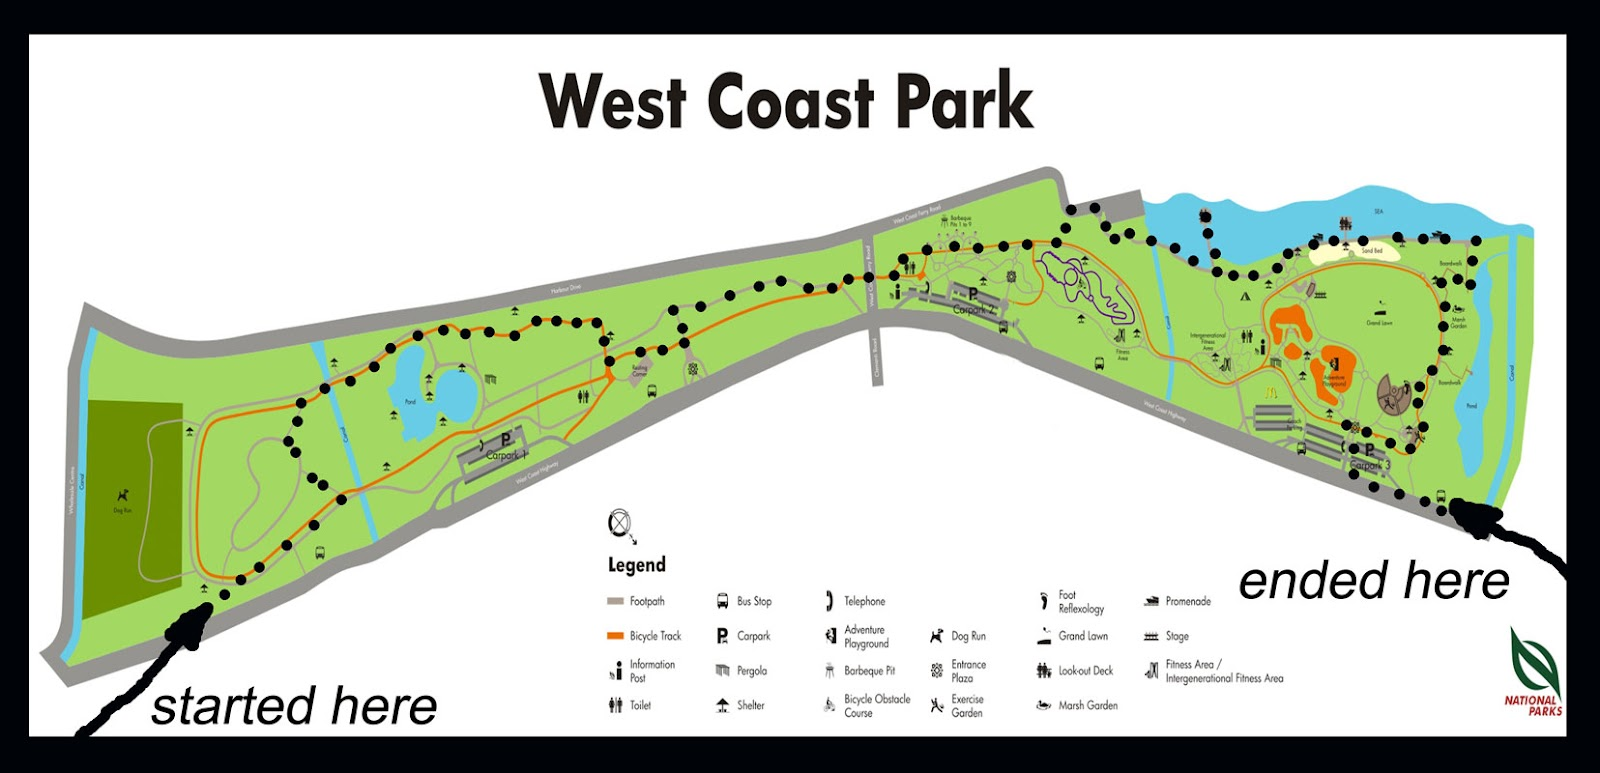 our life in Singapore a walk thru West Coast Park